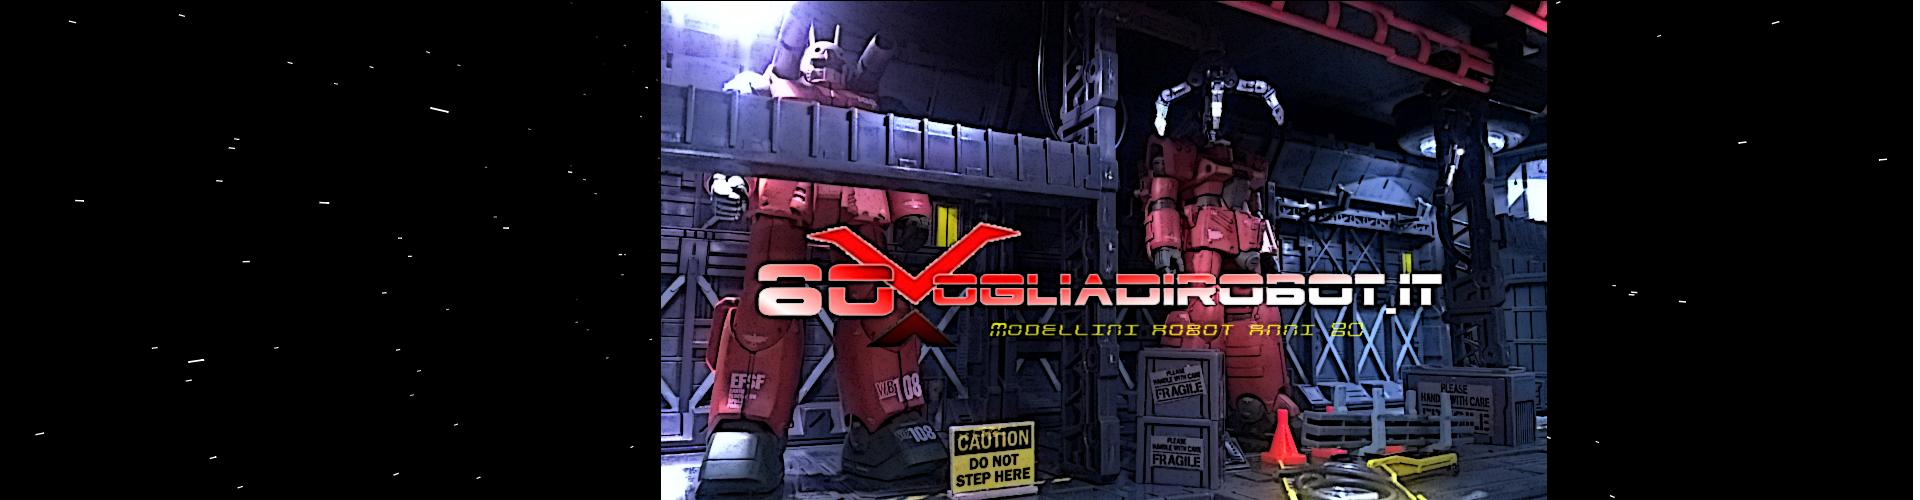 hangar-robot-acquisto-hangar-diorama